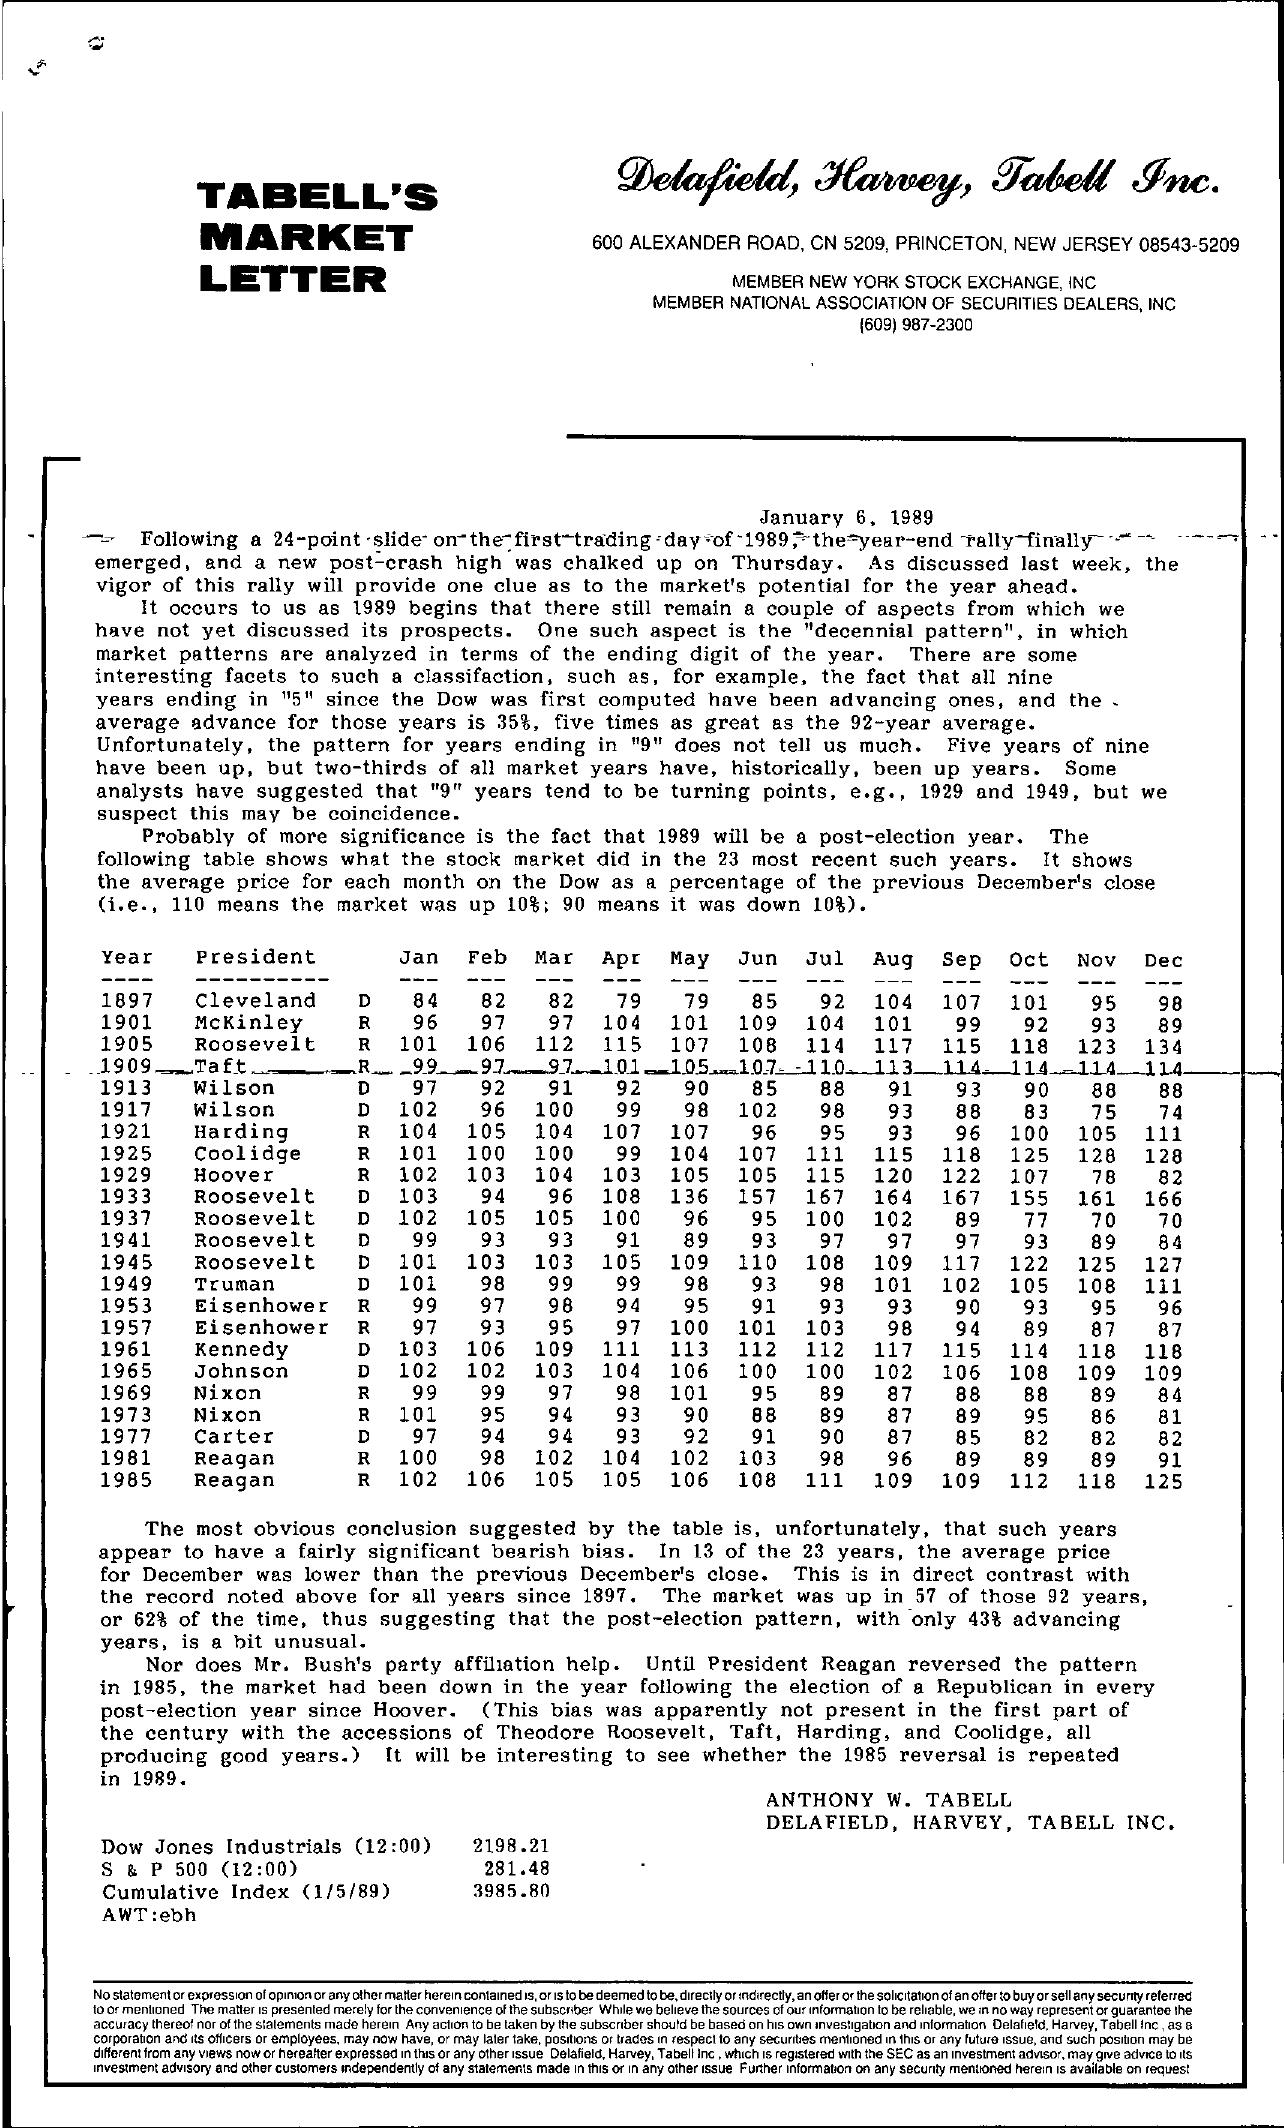 Tabell's Market Letter - January 06, 1989